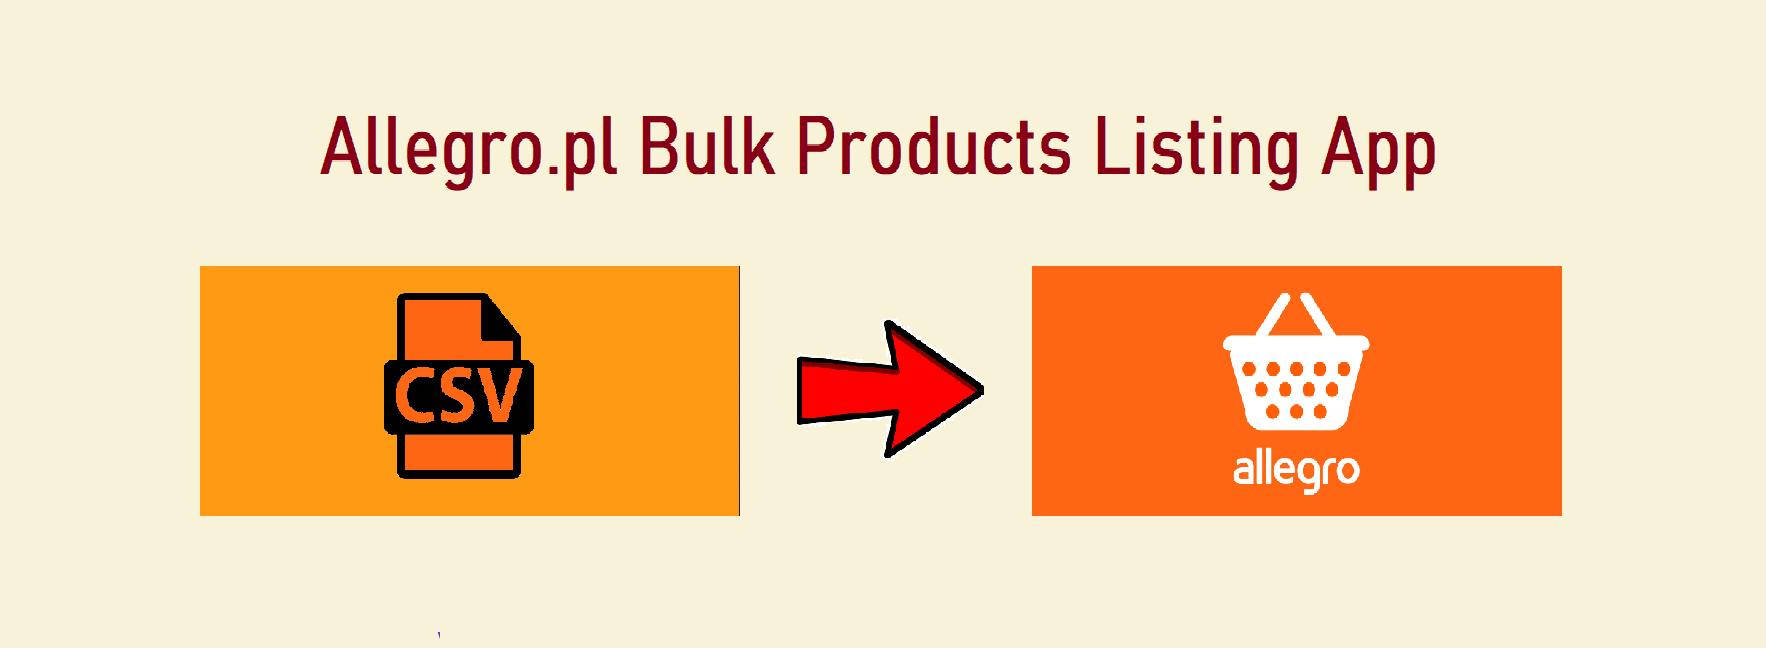 Allegro.pl Bulk Products Listing App